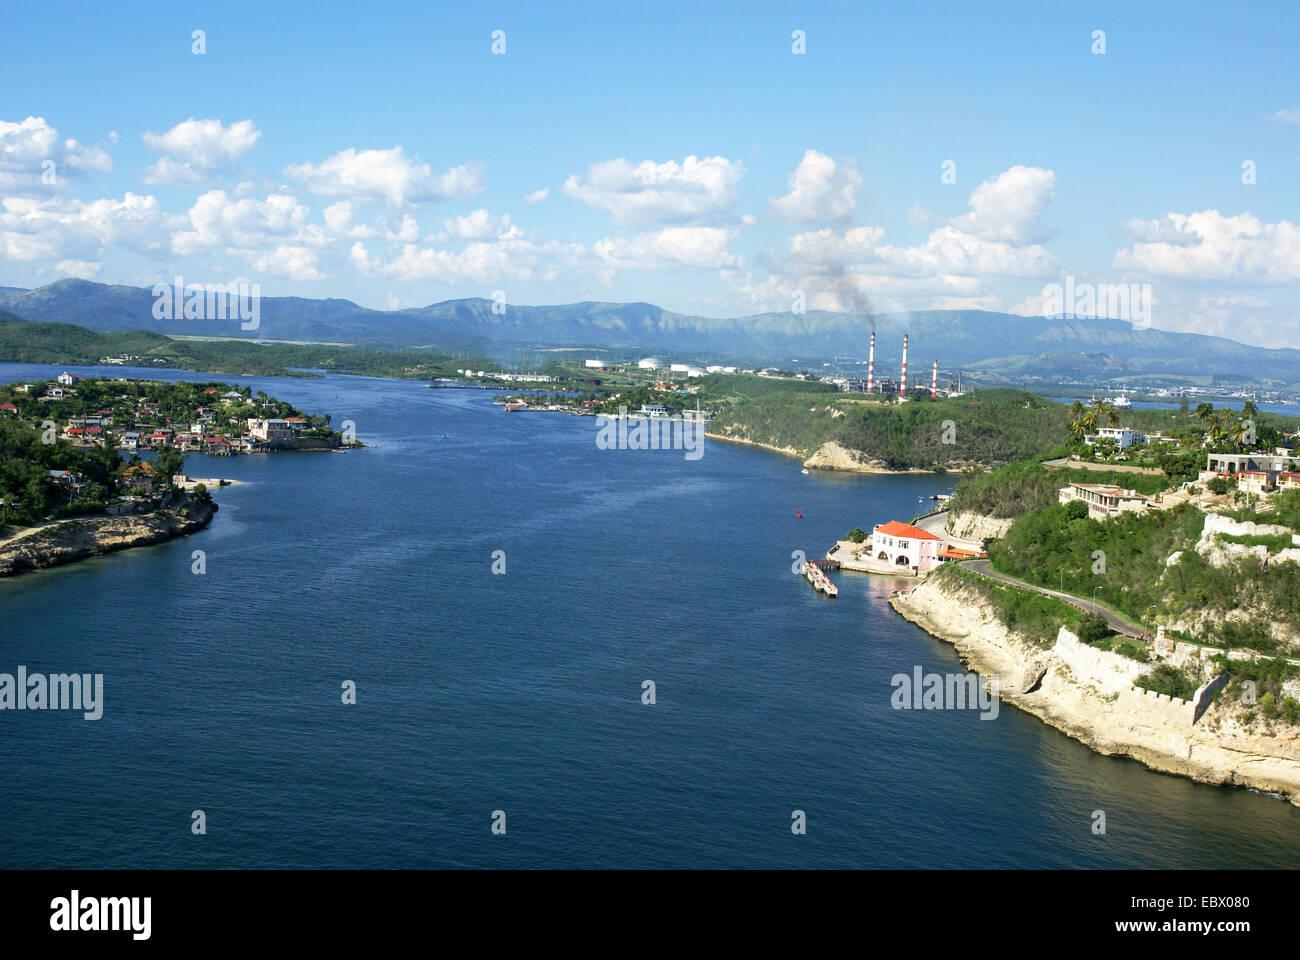 The Bay of Santiago de Cuba, Cuba as seen from the Castillo de San Pedro del Morro fortress - Stock Image